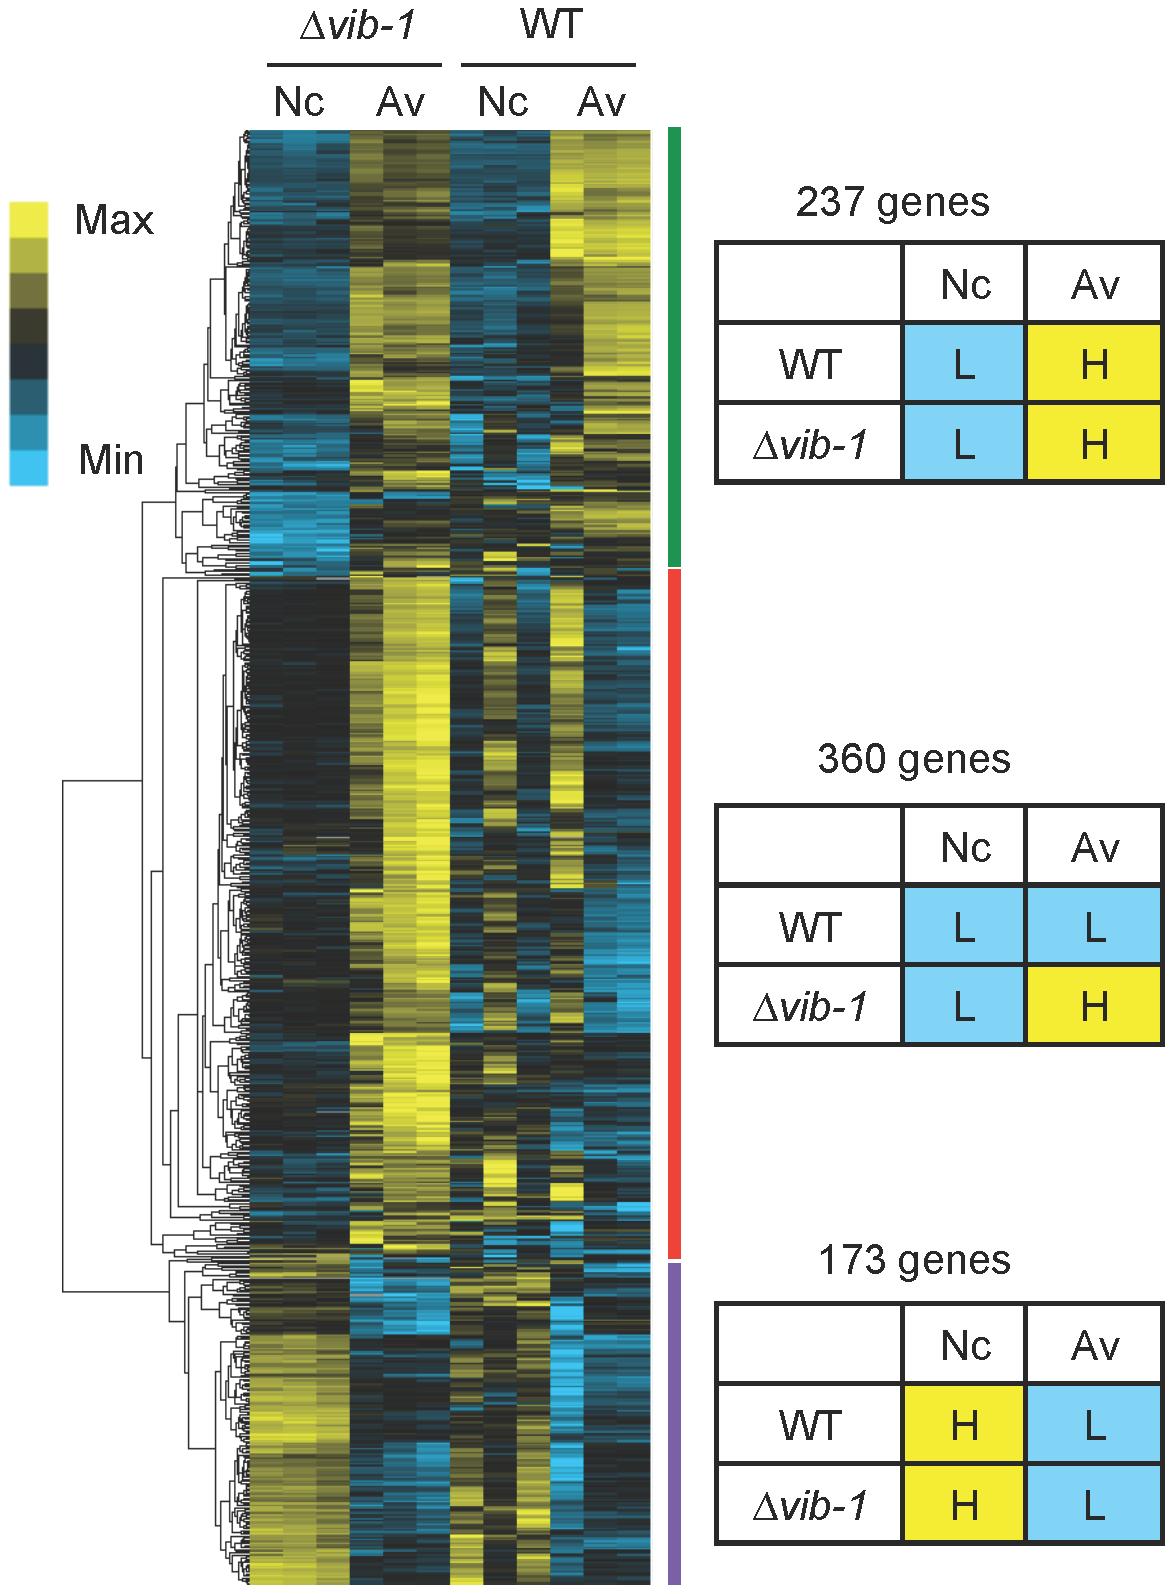 Comparative analysis of gene expression between Δ<i>vib-1</i> and WT shifted to media lacking a carbon source (Nc) versus Avicel (Av) revealed potential CCR regulators.